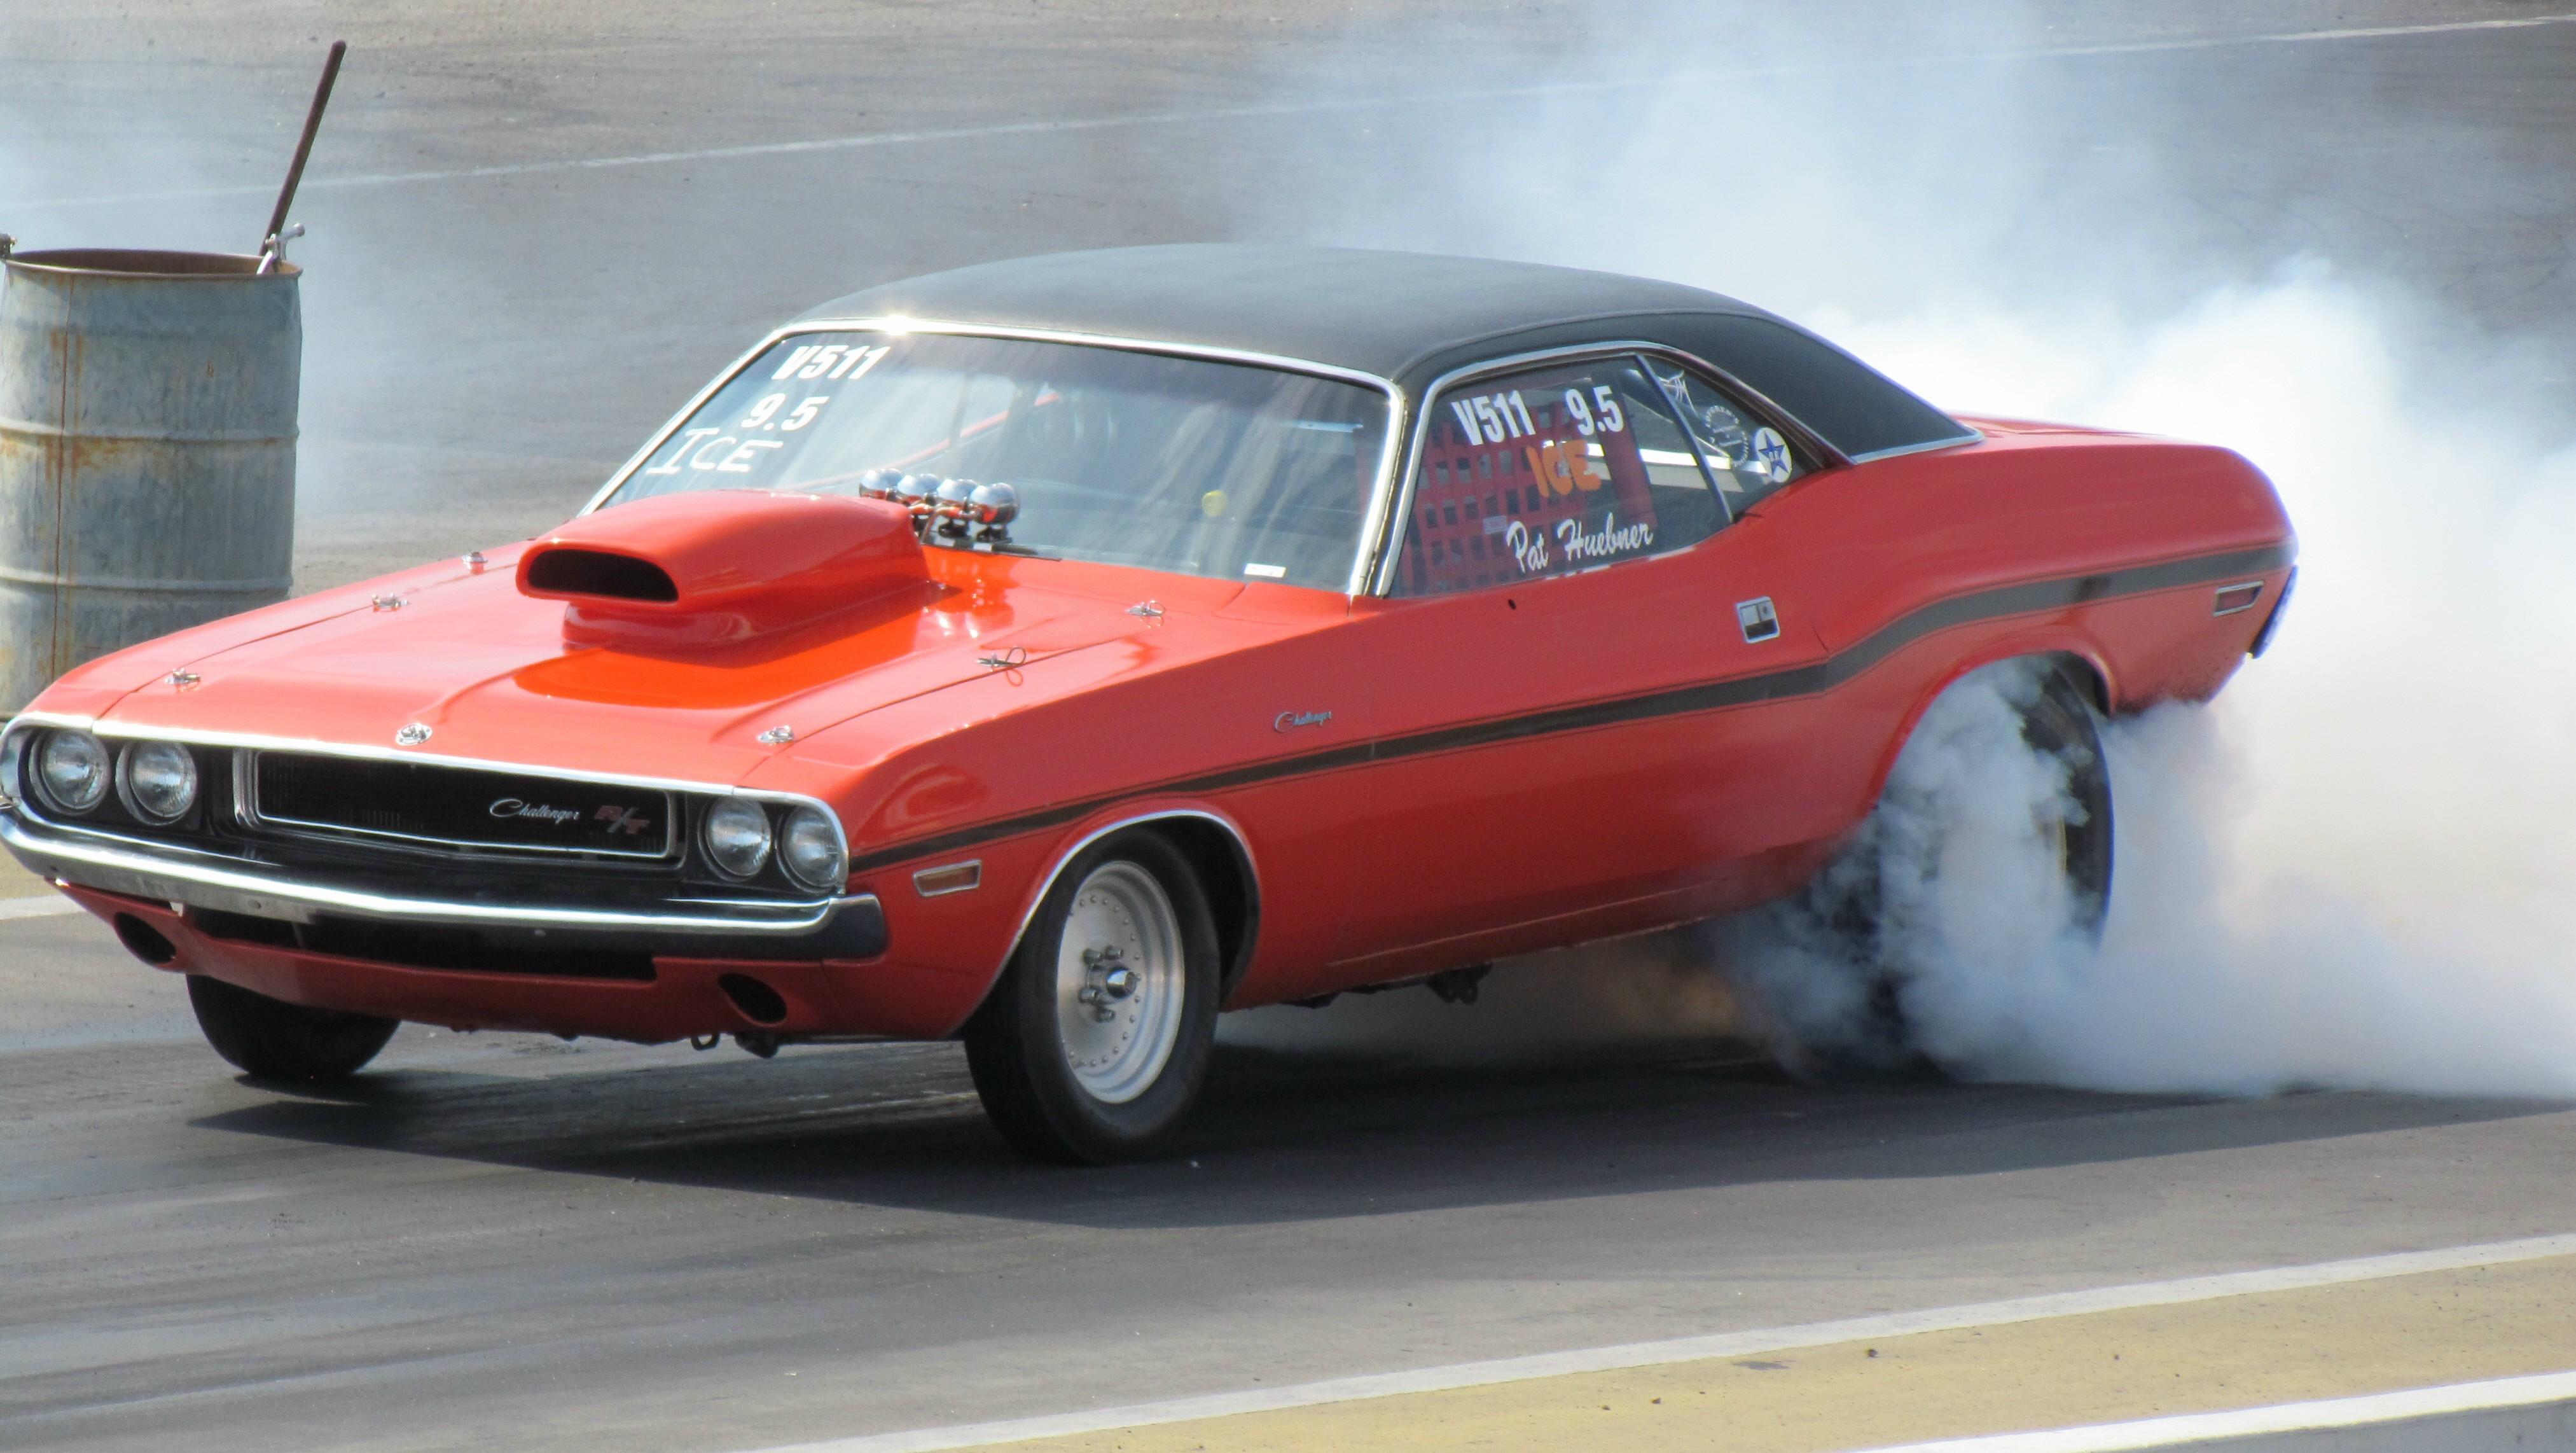 1970 dodge challenger r t drag car wallpaper forwallpaper com